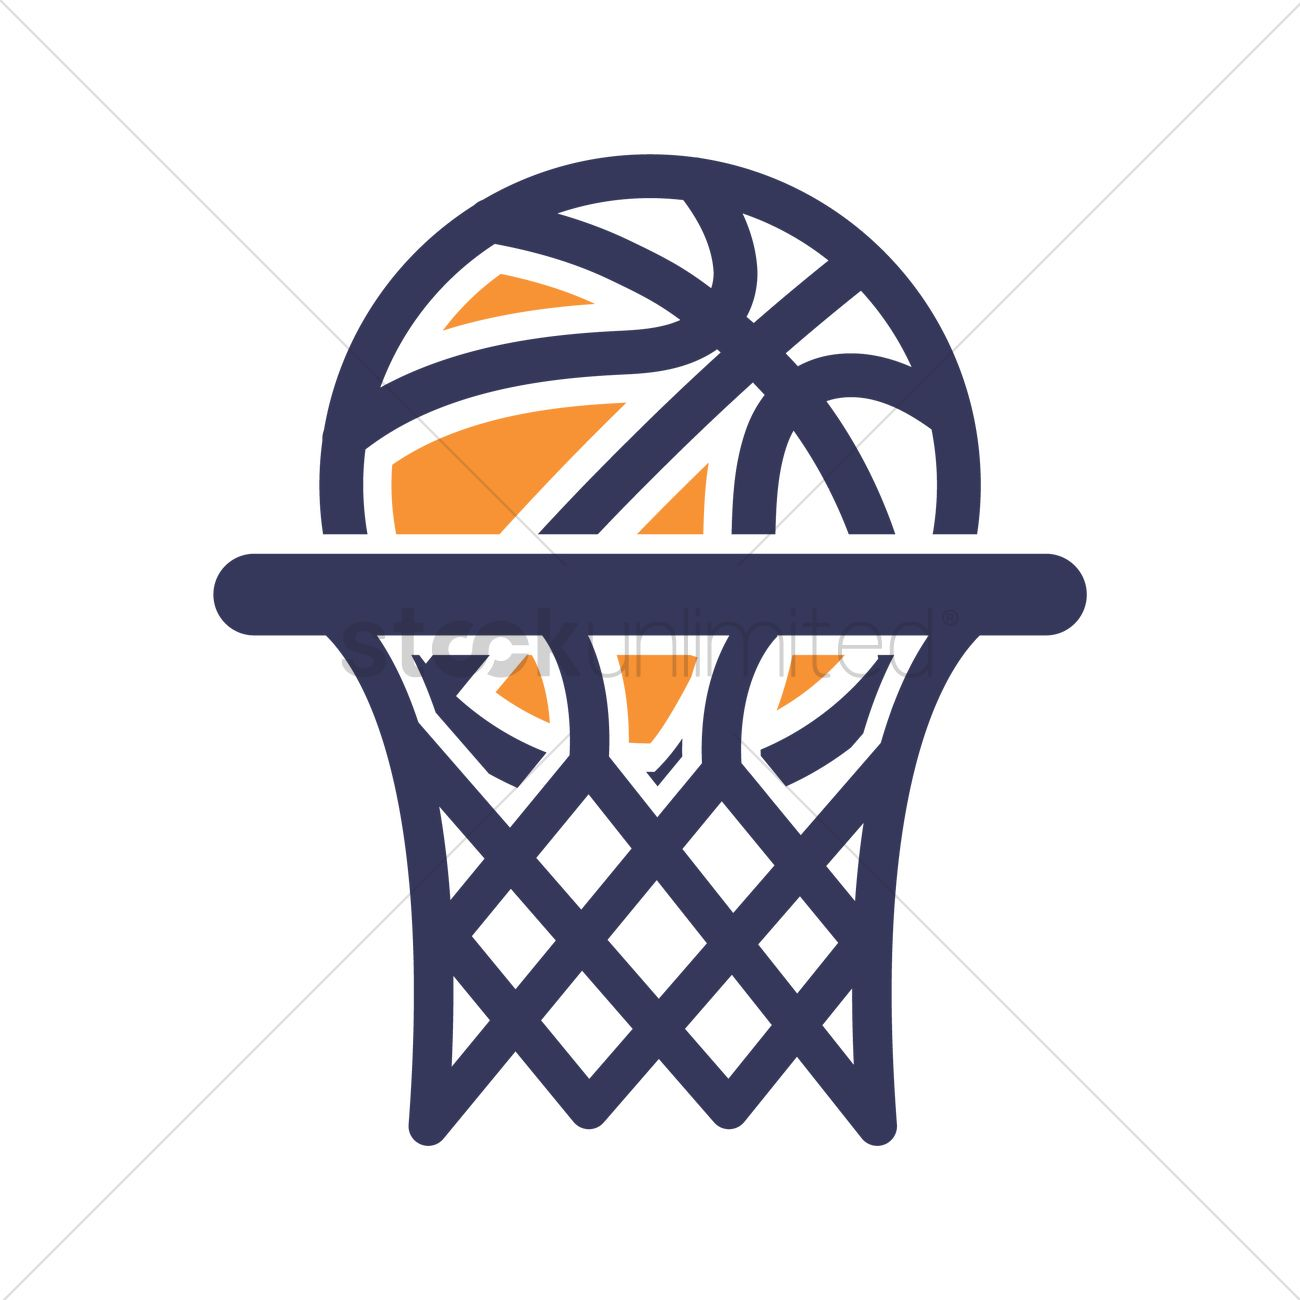 1300x1300 Basketball Hoop Icon Vector Image